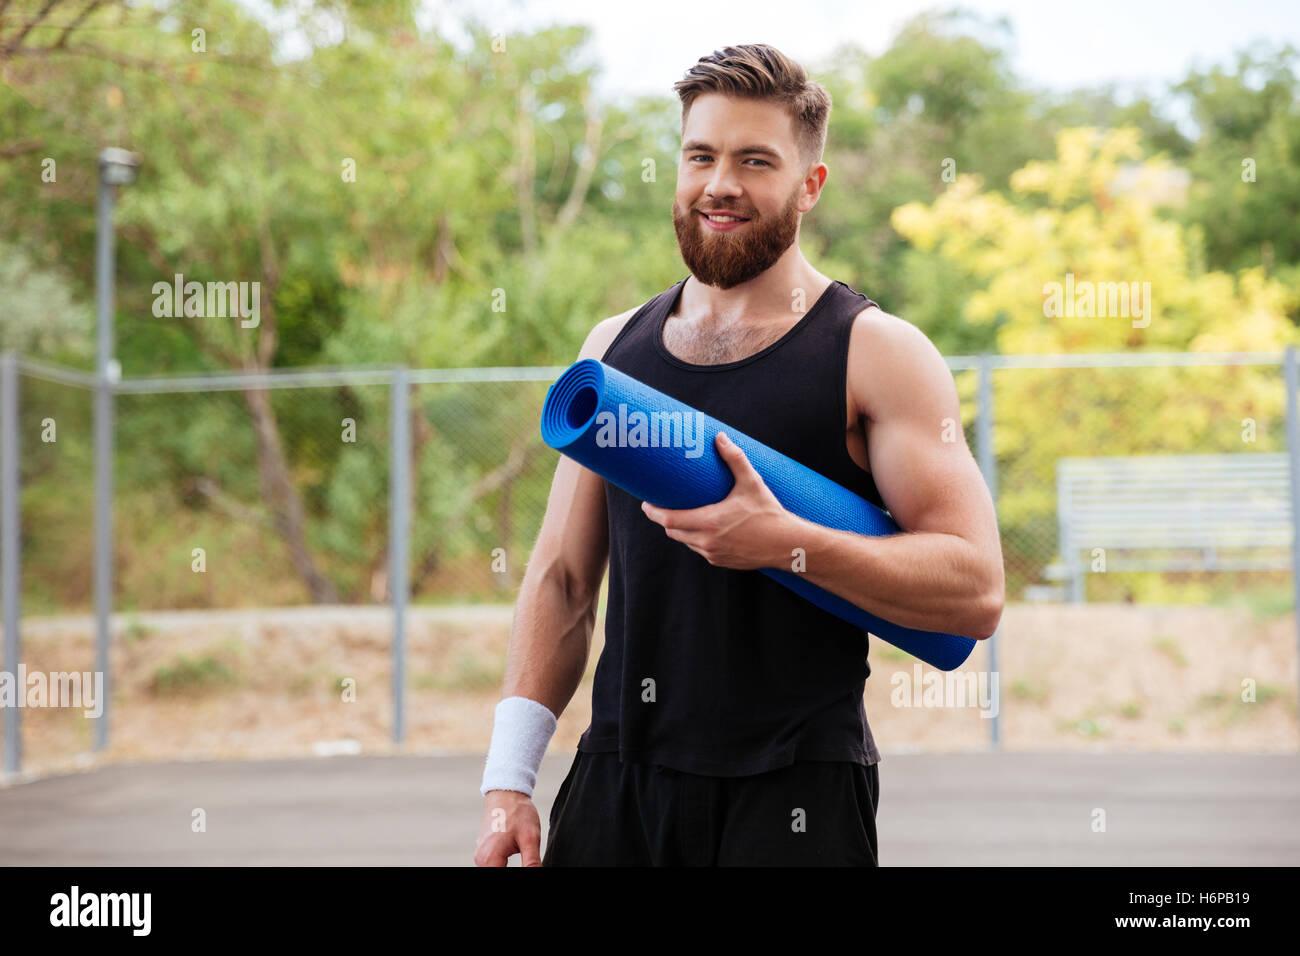 Smiling happy fitness barbu homme avec un tapis de yoga standing outdoors Photo Stock